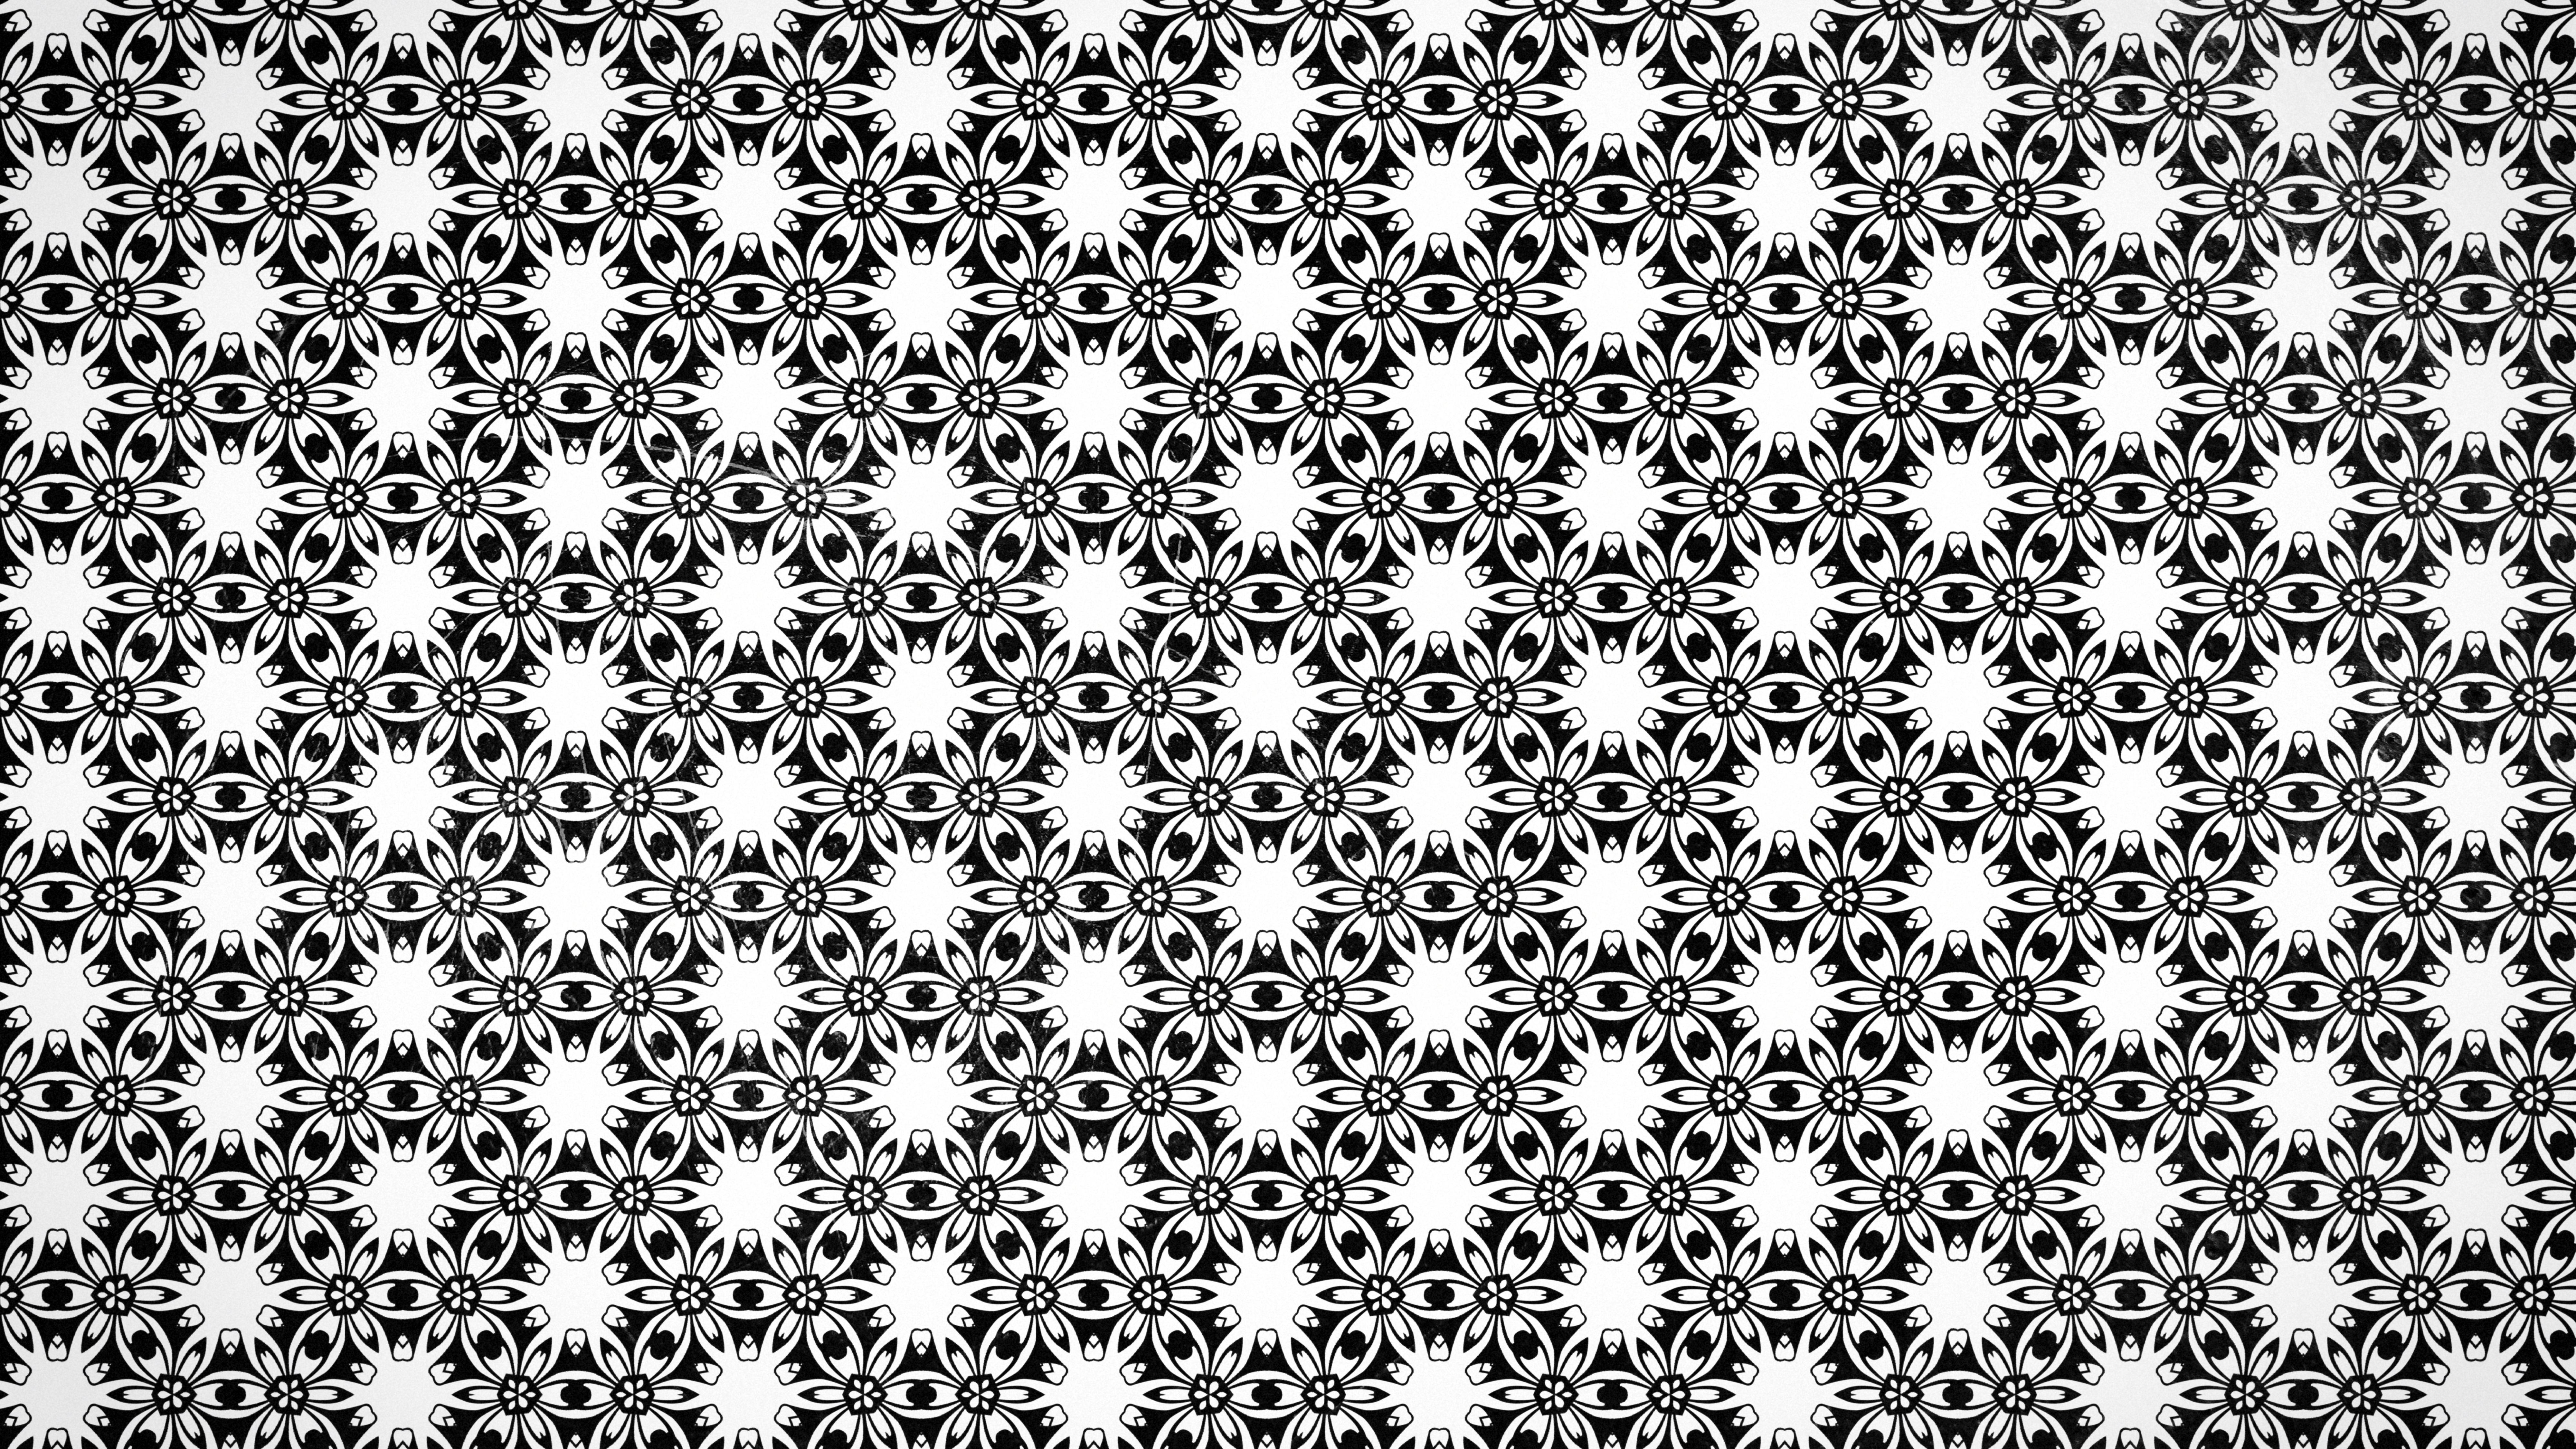 Black And White Vintage Floral Seamless Pattern Wallpaper Design